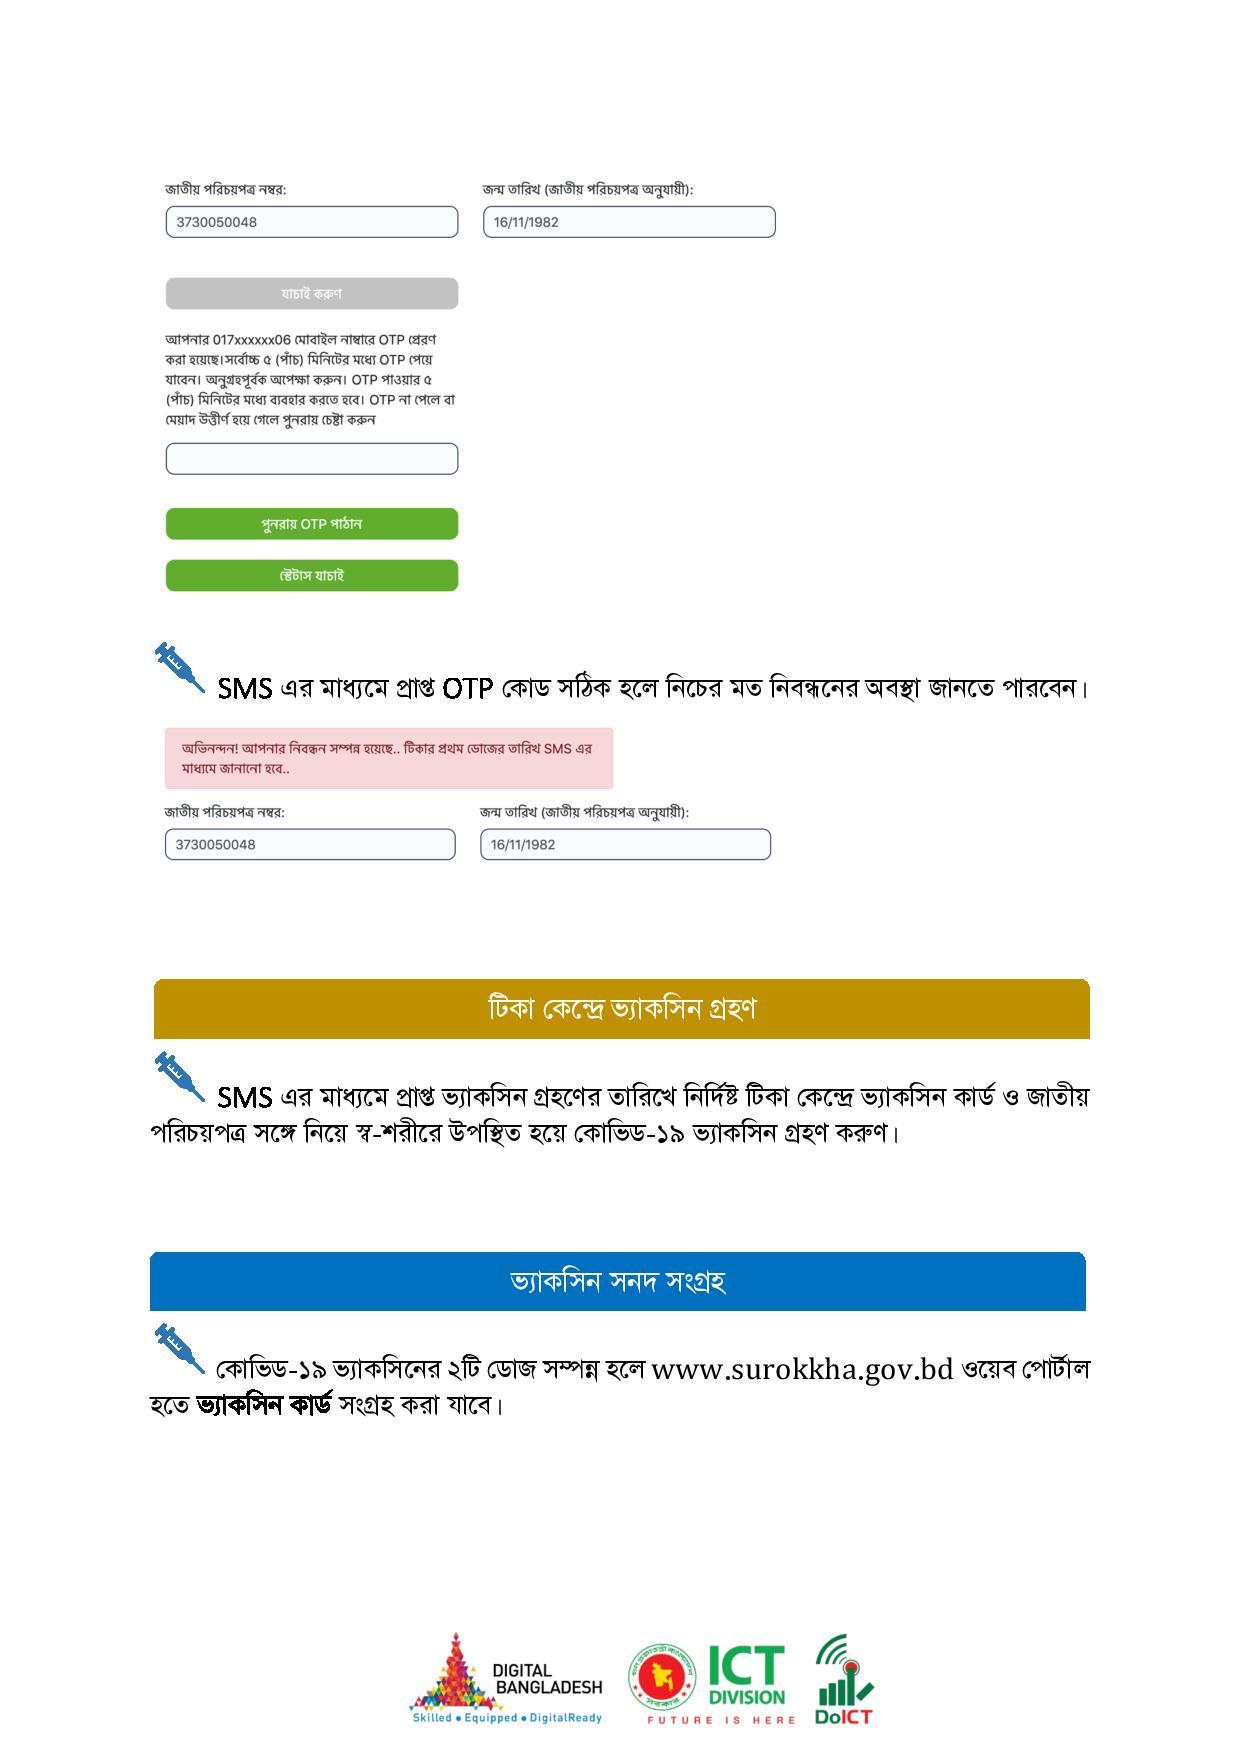 Surokkha_Web_Portal_User_Manual